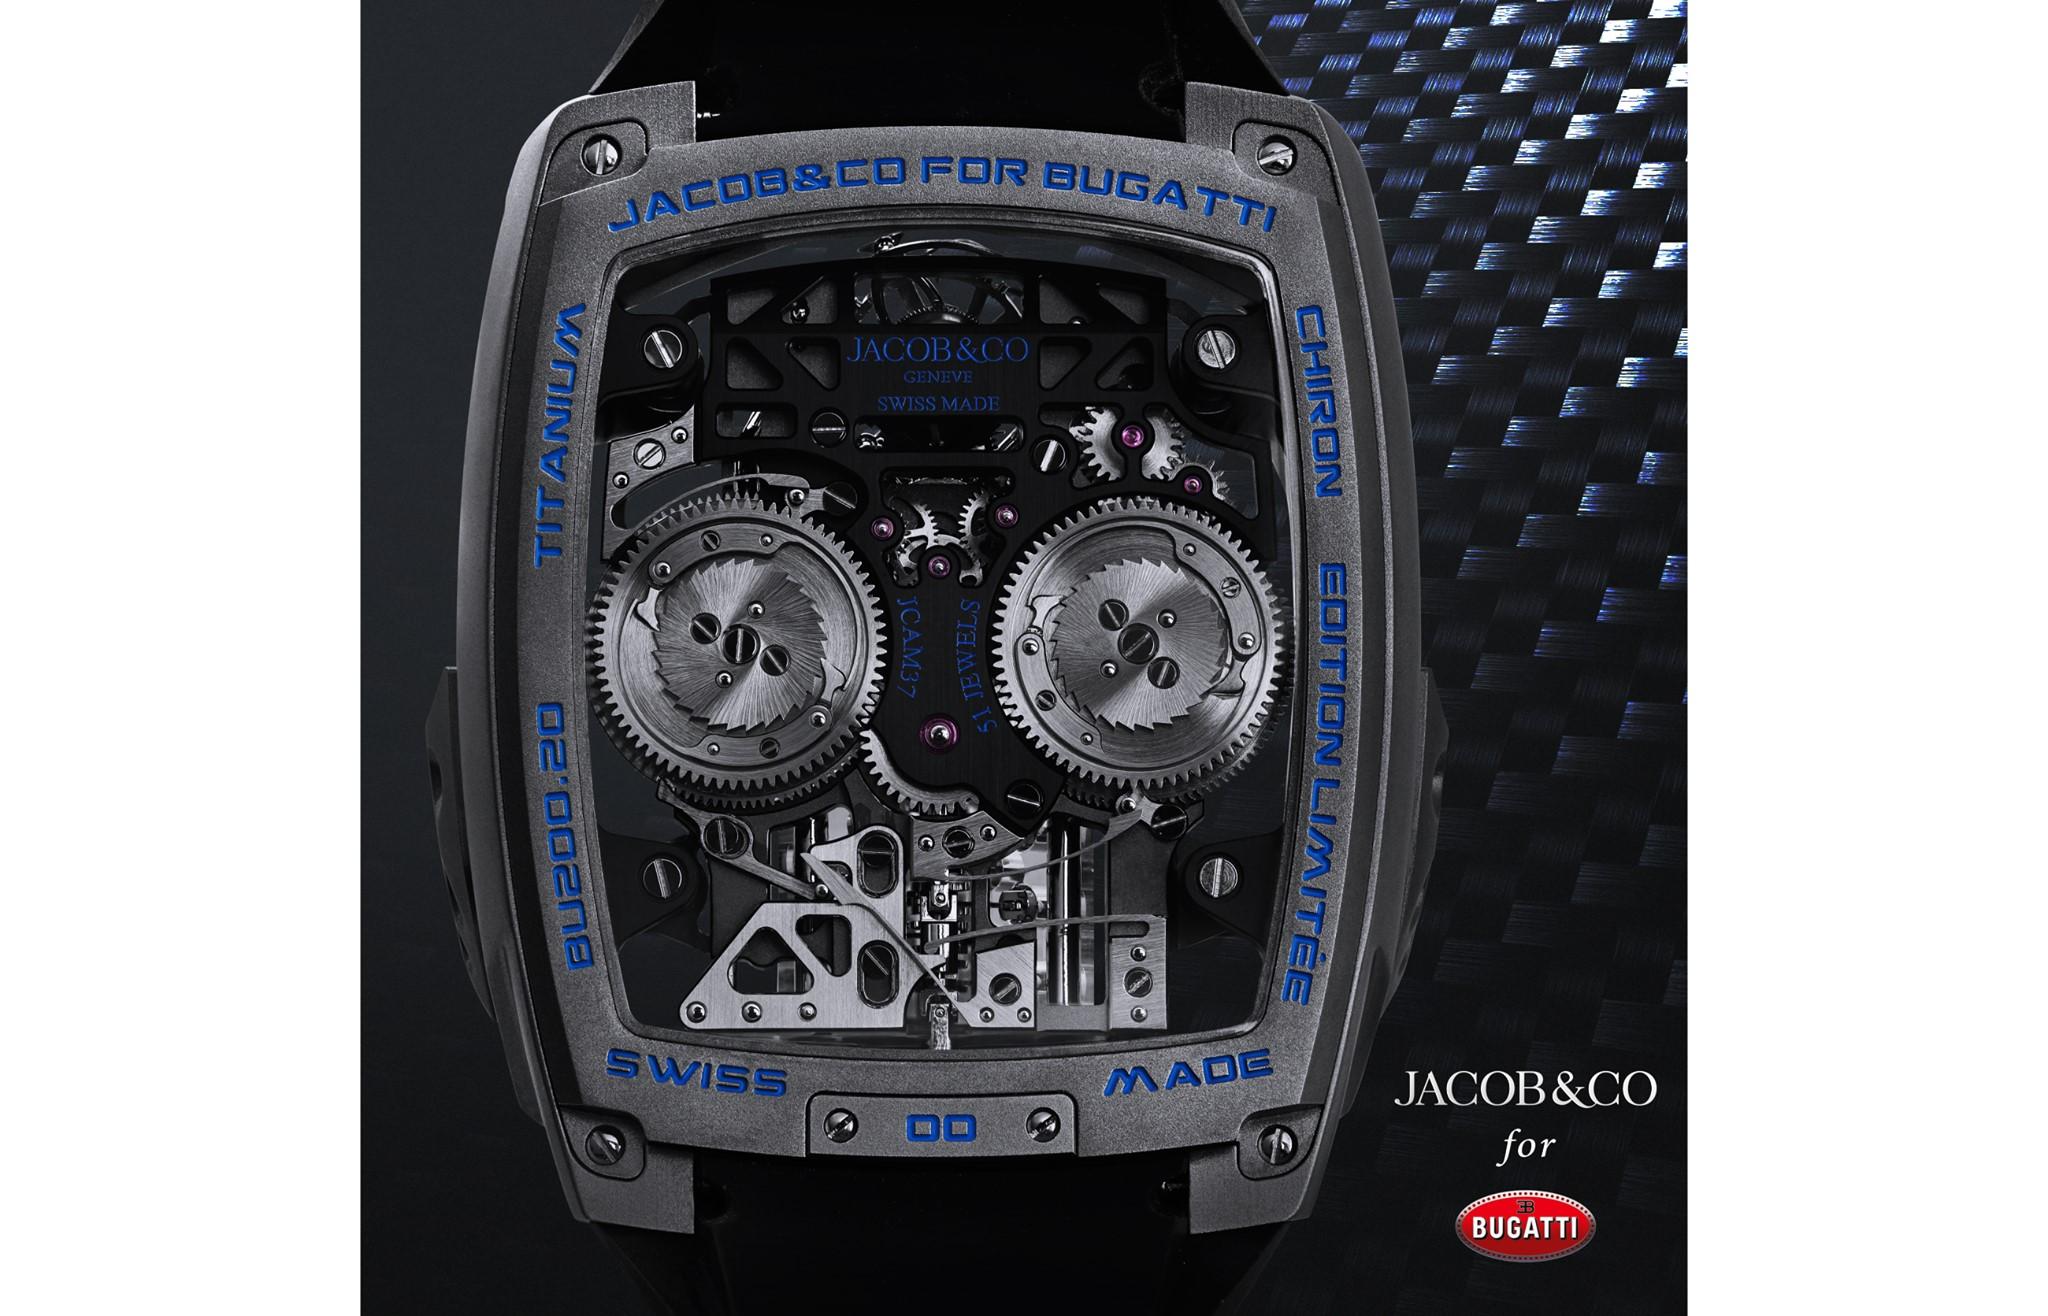 Bugatti Chiron Tourbillon Jacob and Co-back